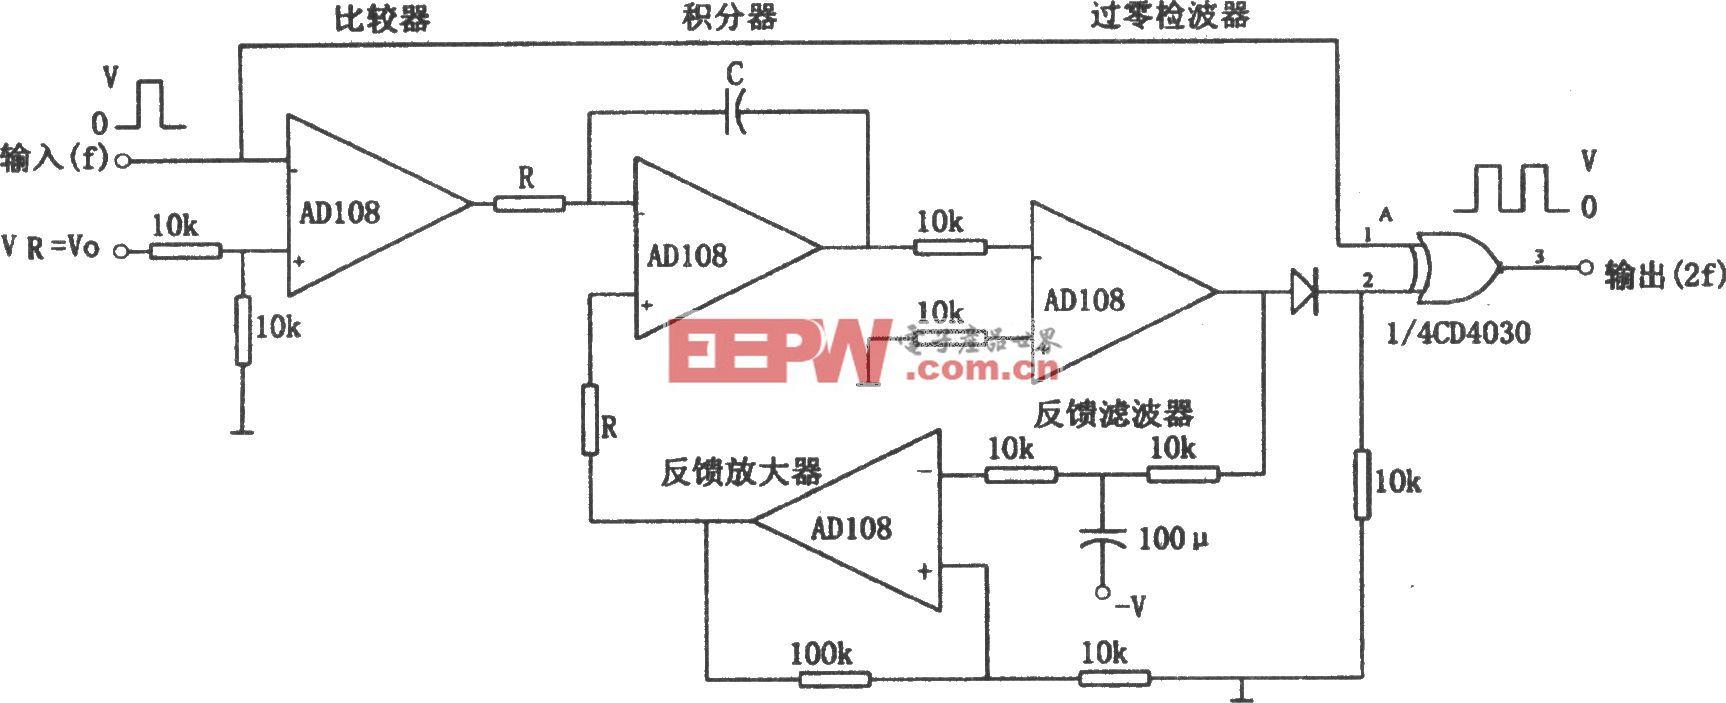 AD108构成的可输入非对称方波的倍频器